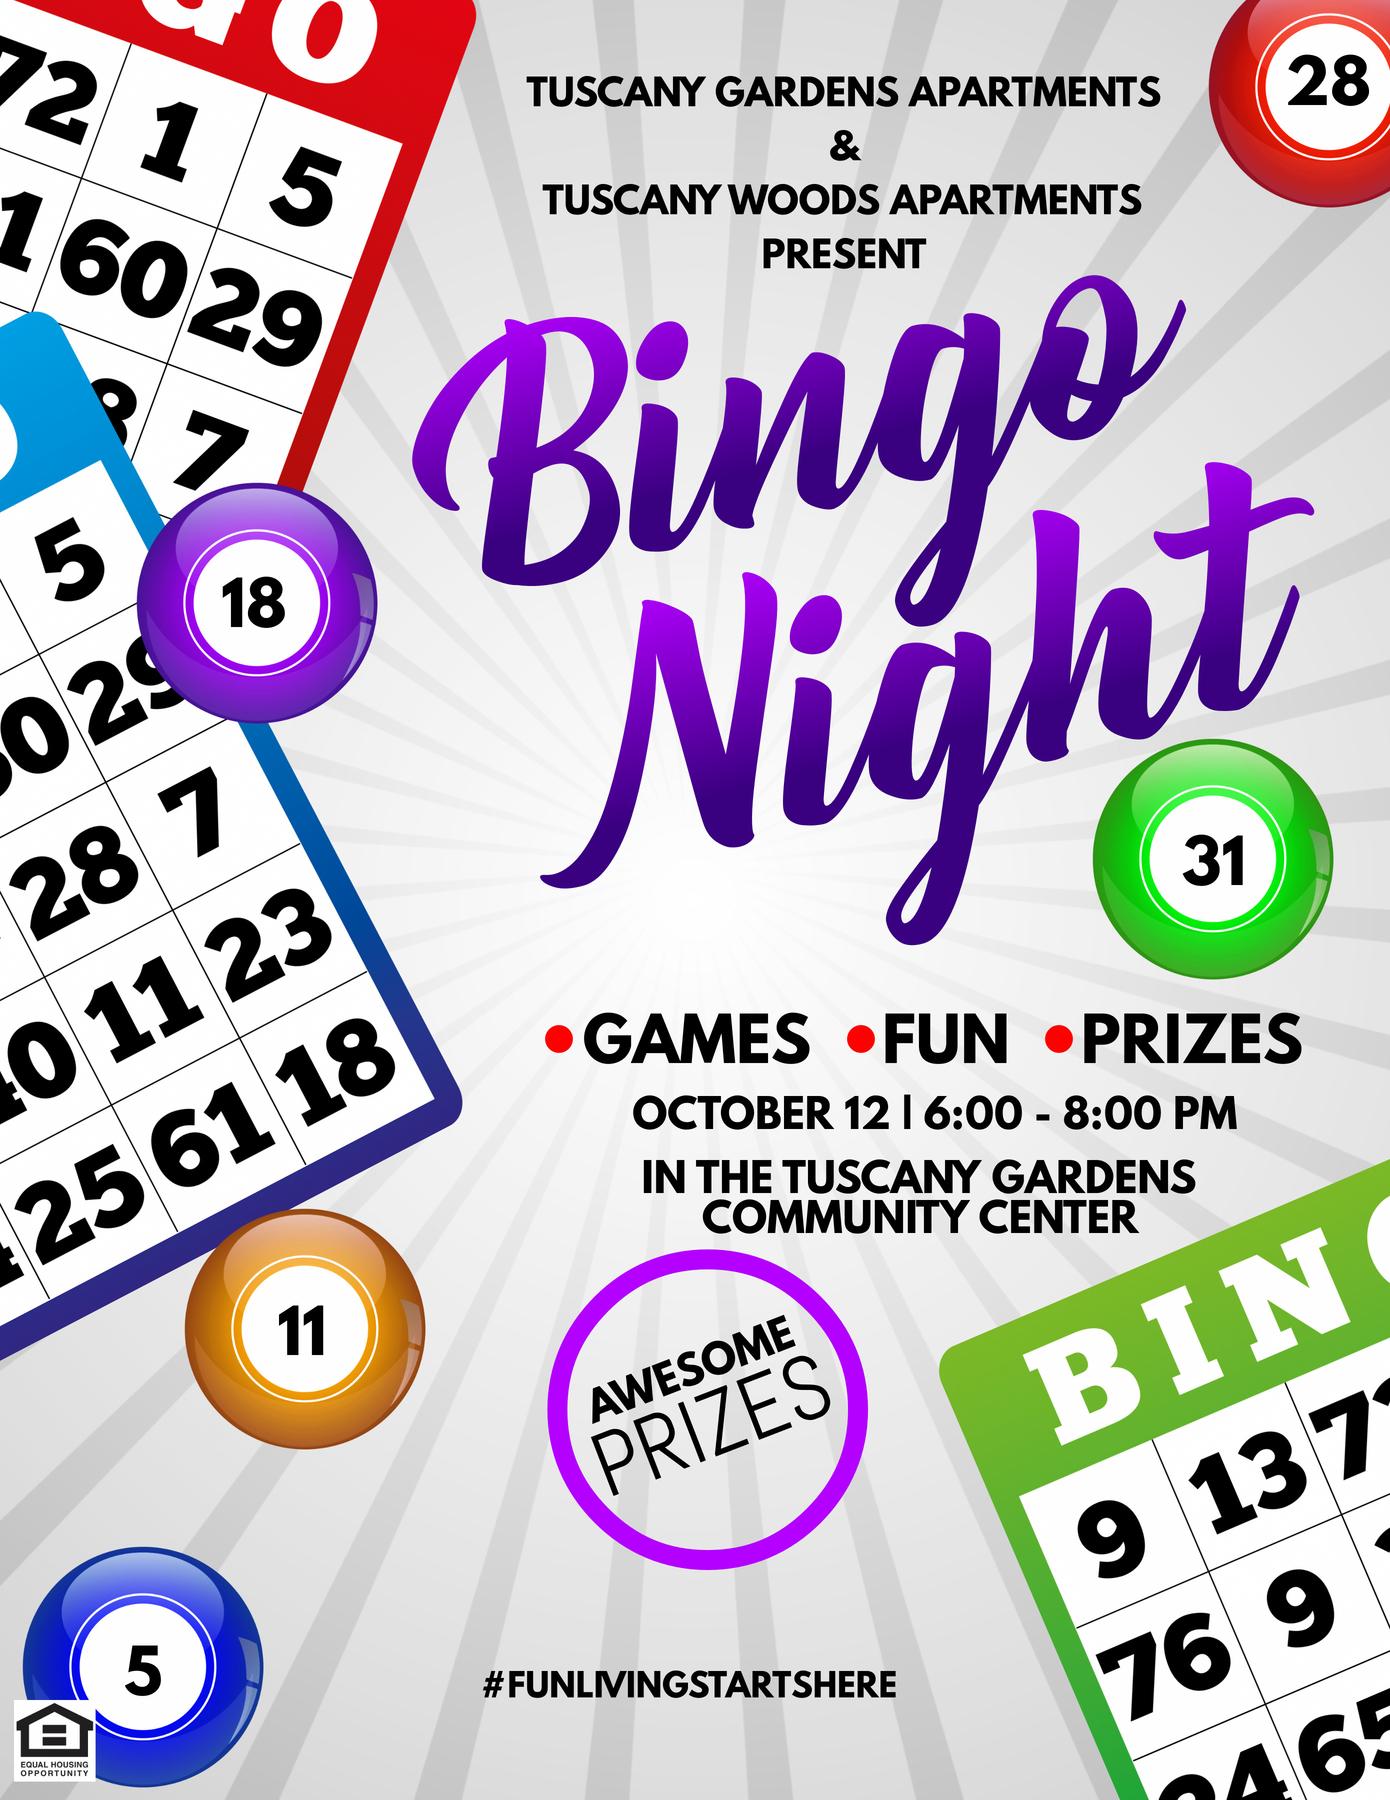 Copy of Bingo Night Flyer.jpg